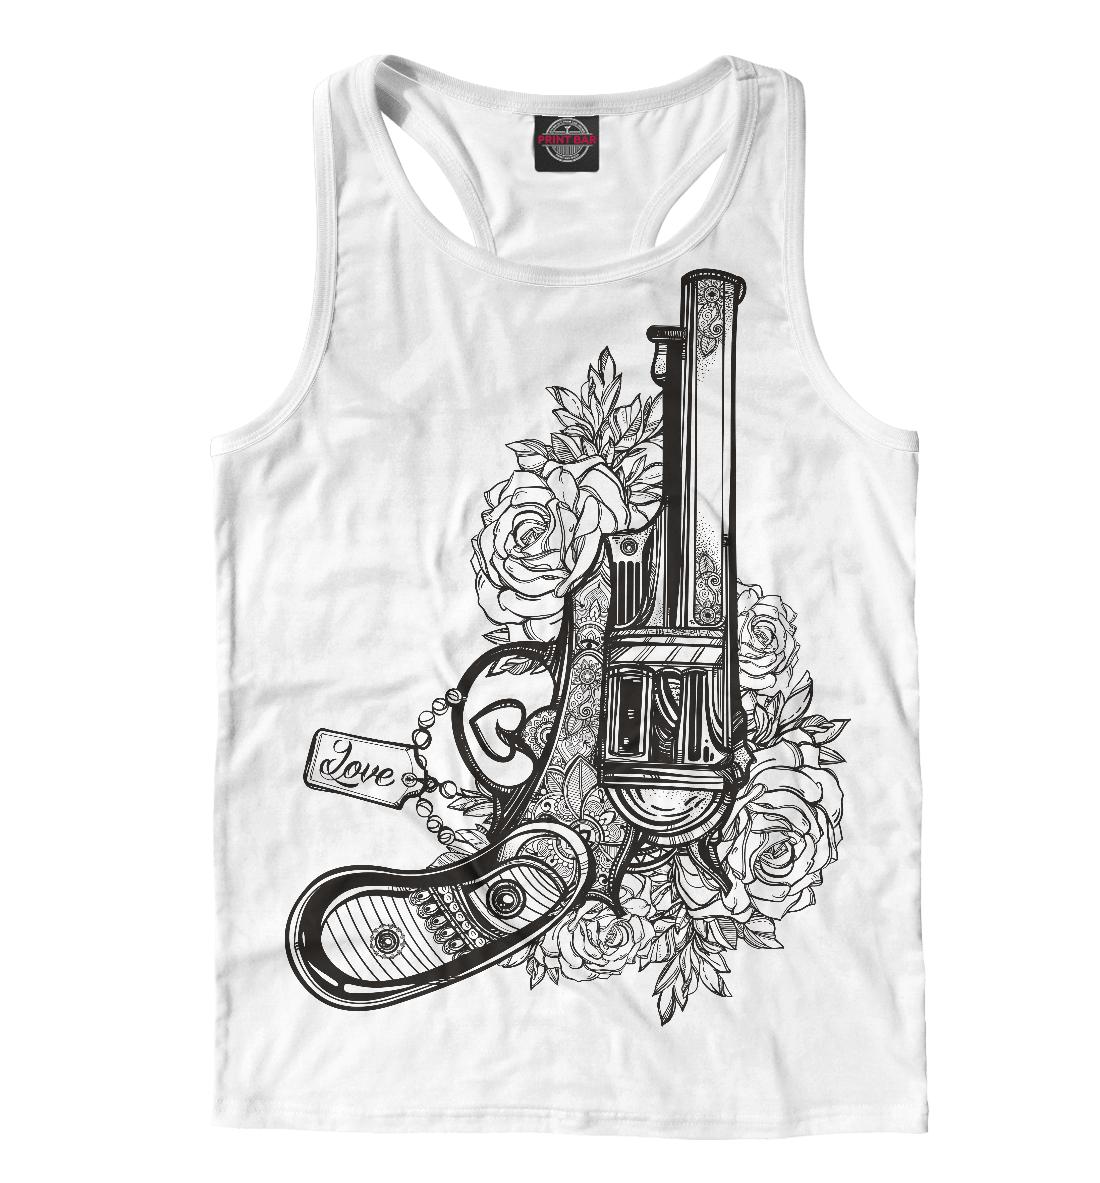 Купить Пистолет, Printbar, Майки борцовки, HIP-750717-mayb-2